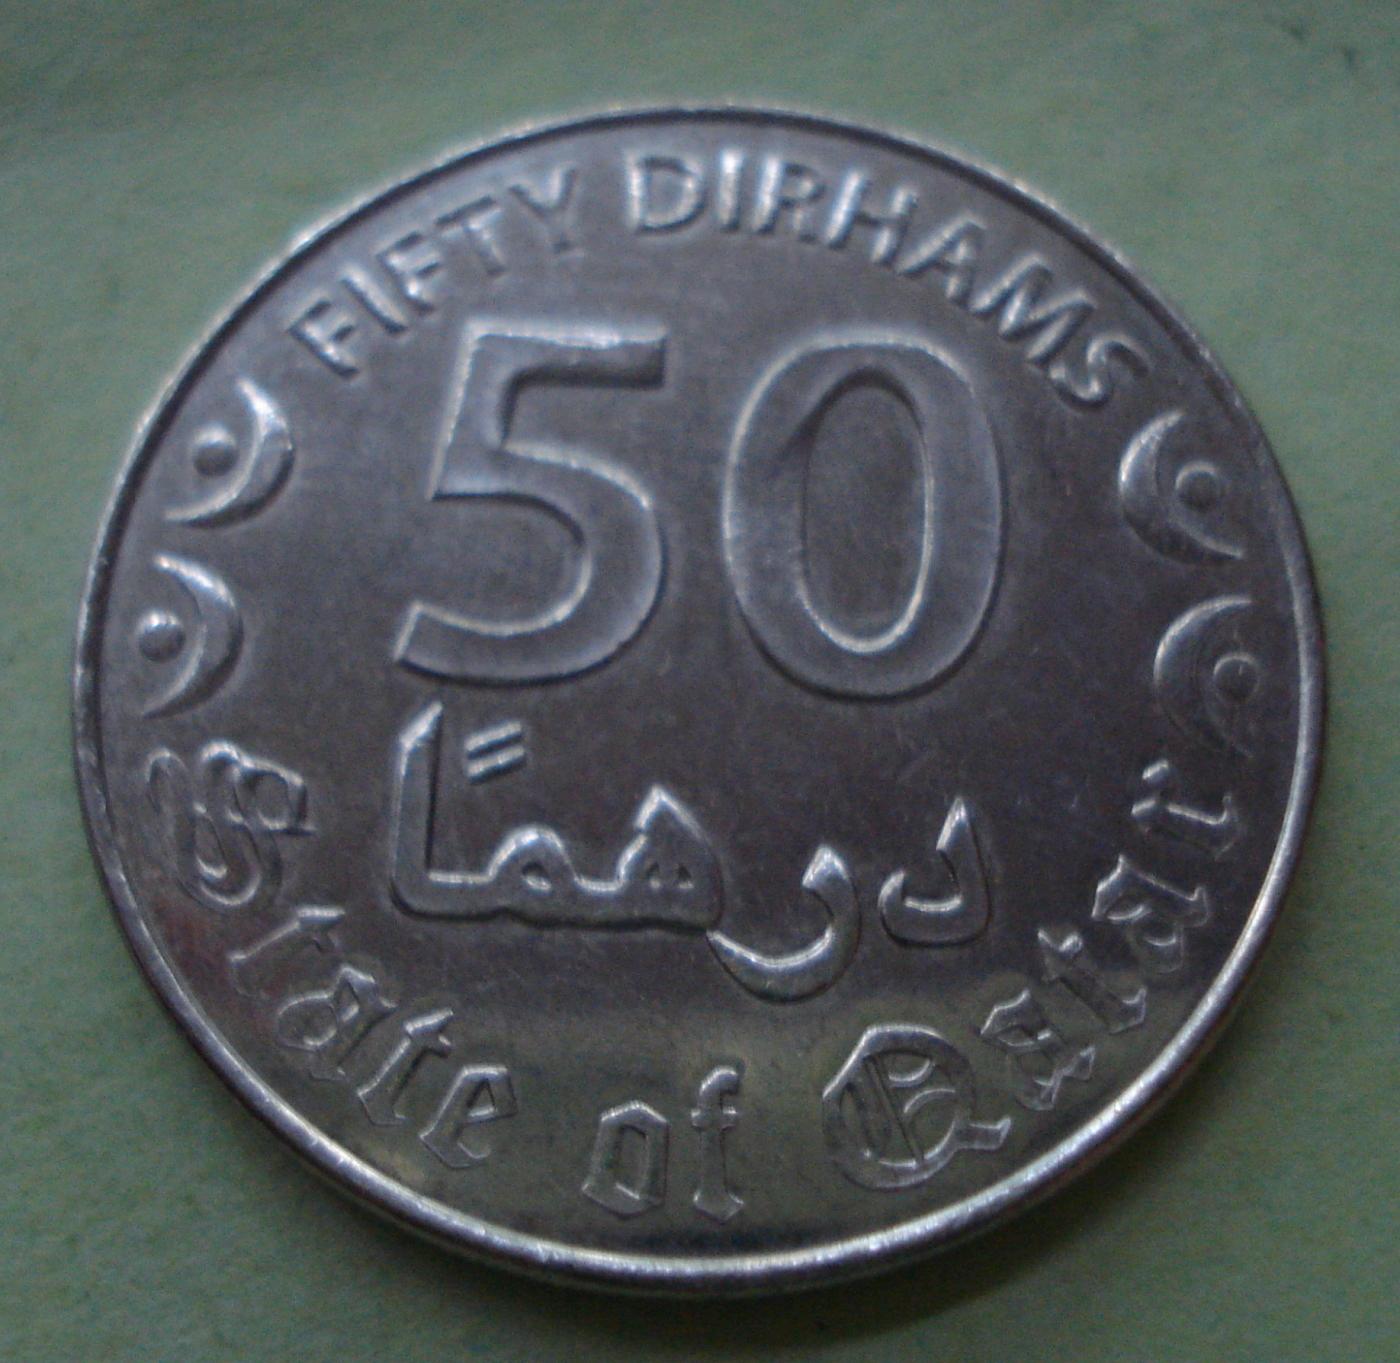 Zrx Coin Today Qatar Bon Coin Paris Vetement Bebe